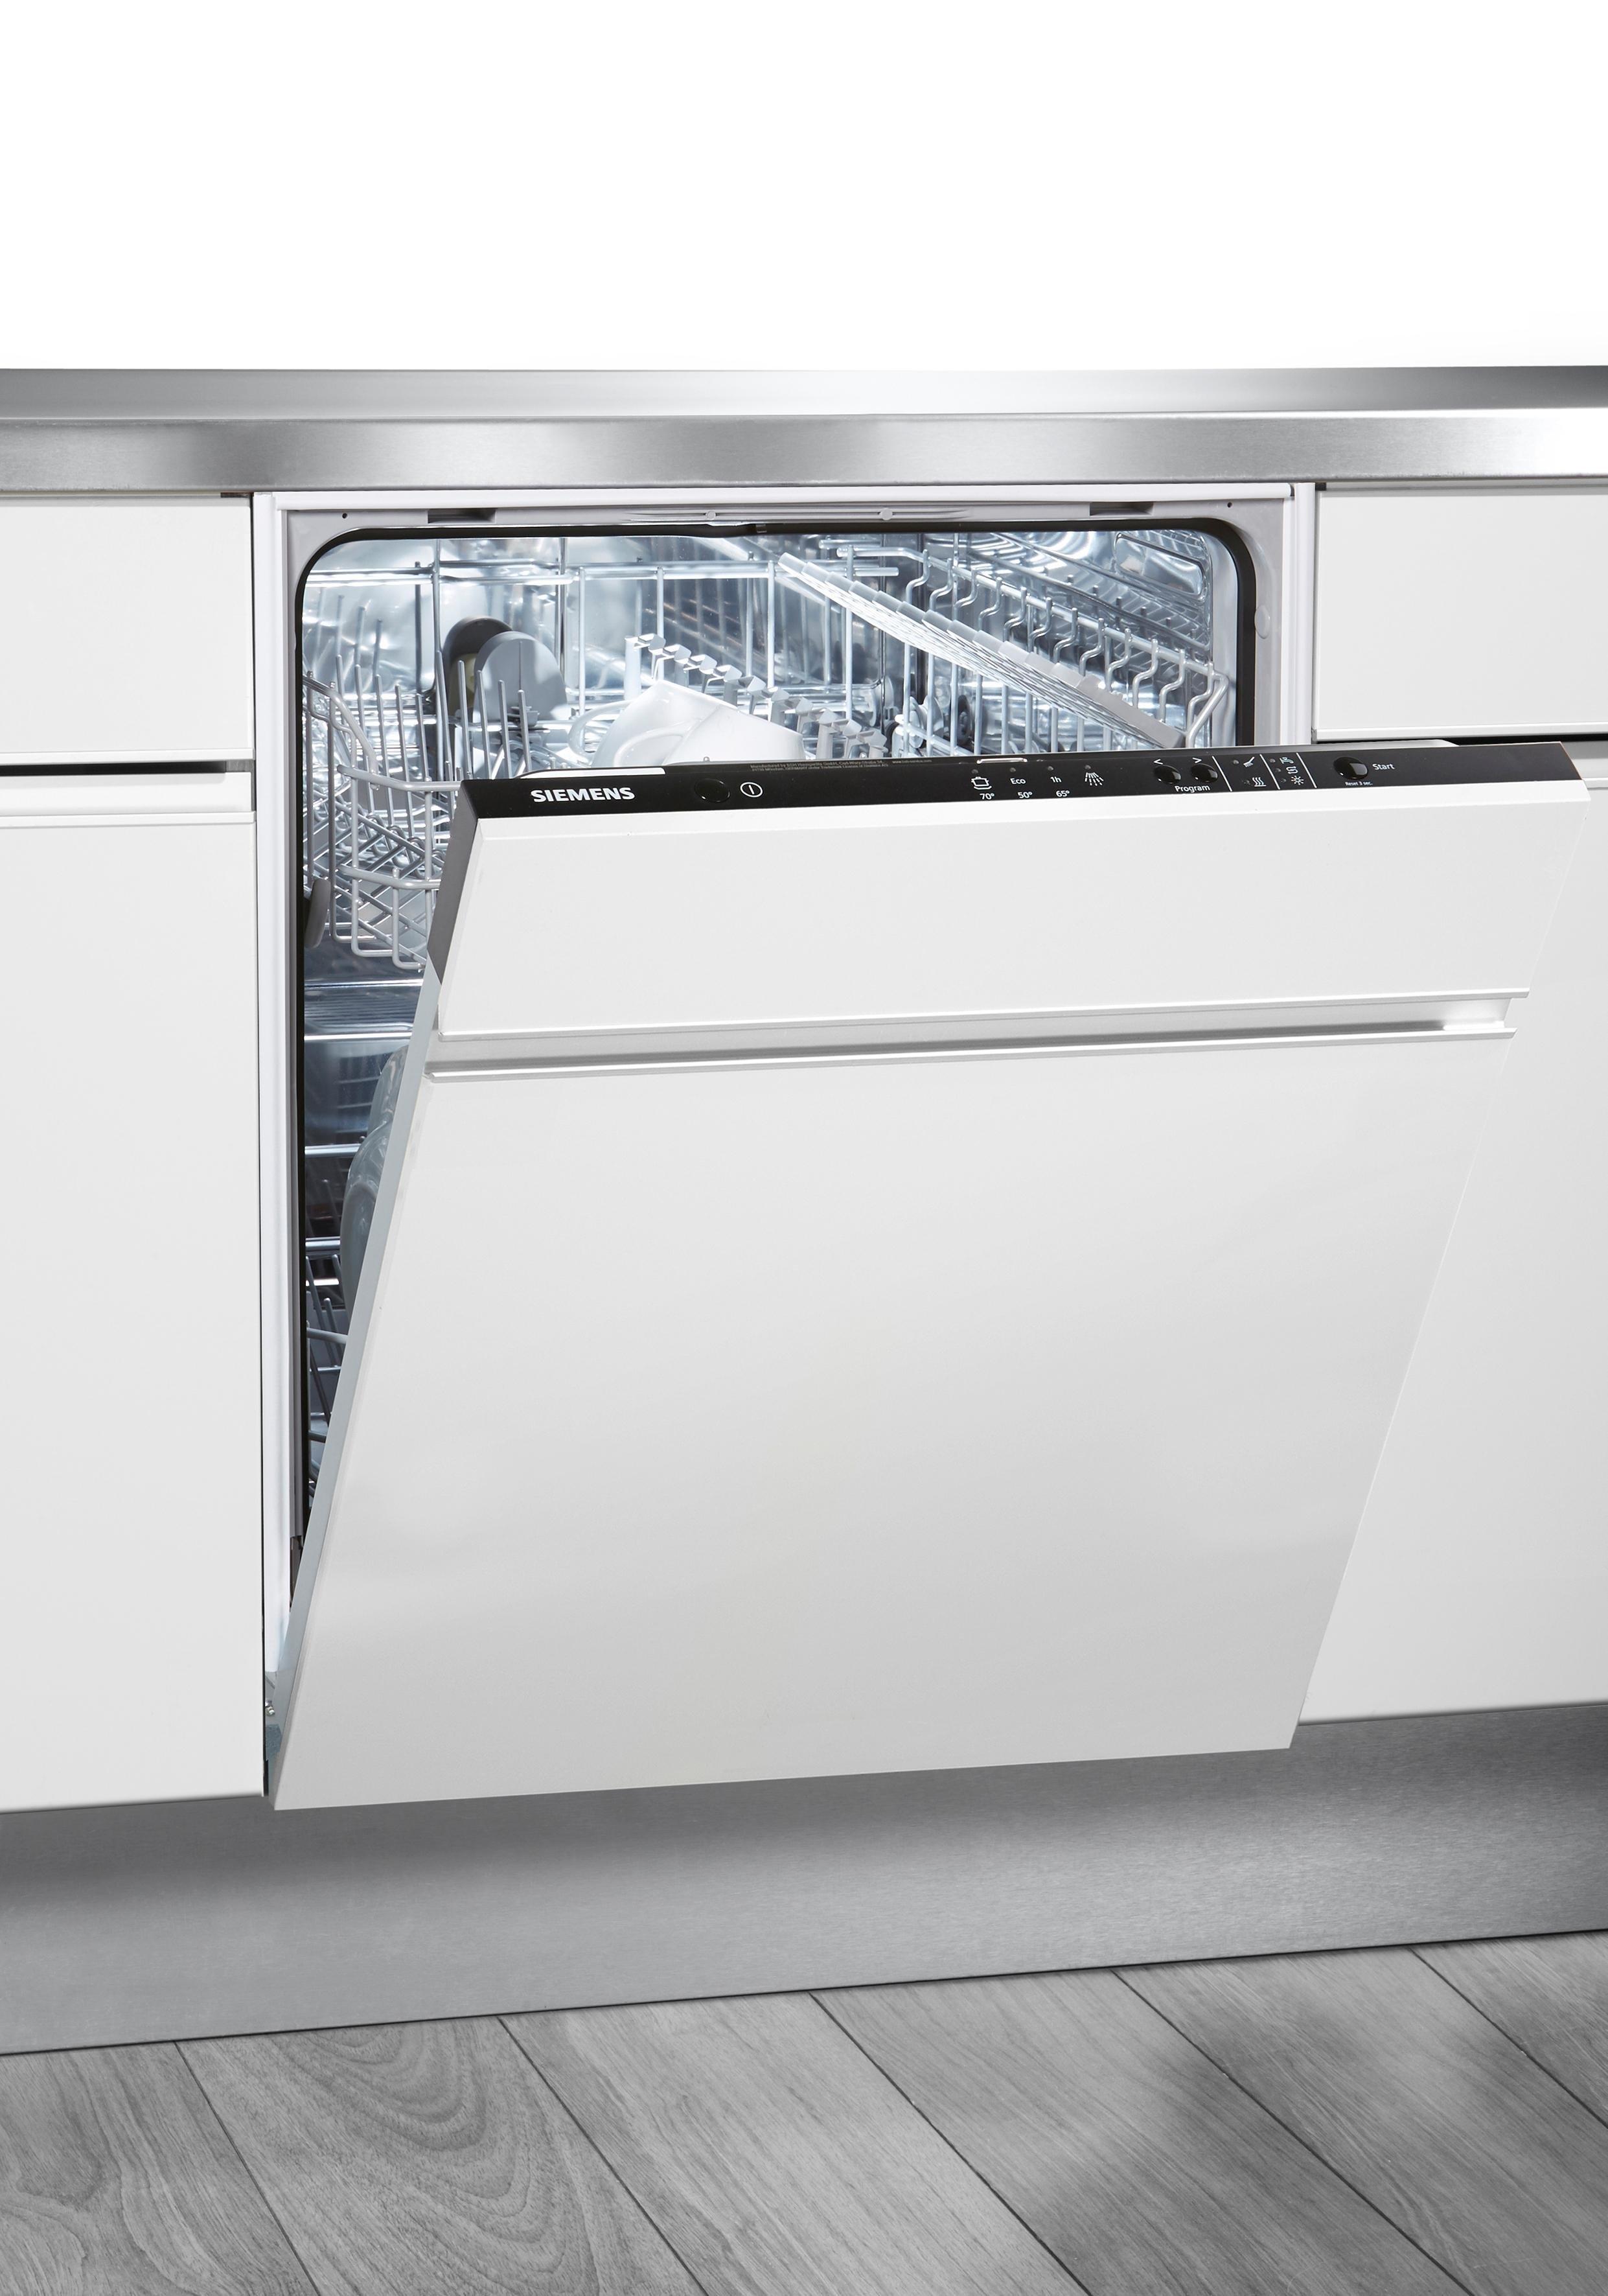 Siemens inbouwvaatwasser SN614X00AE online kopen op otto.nl